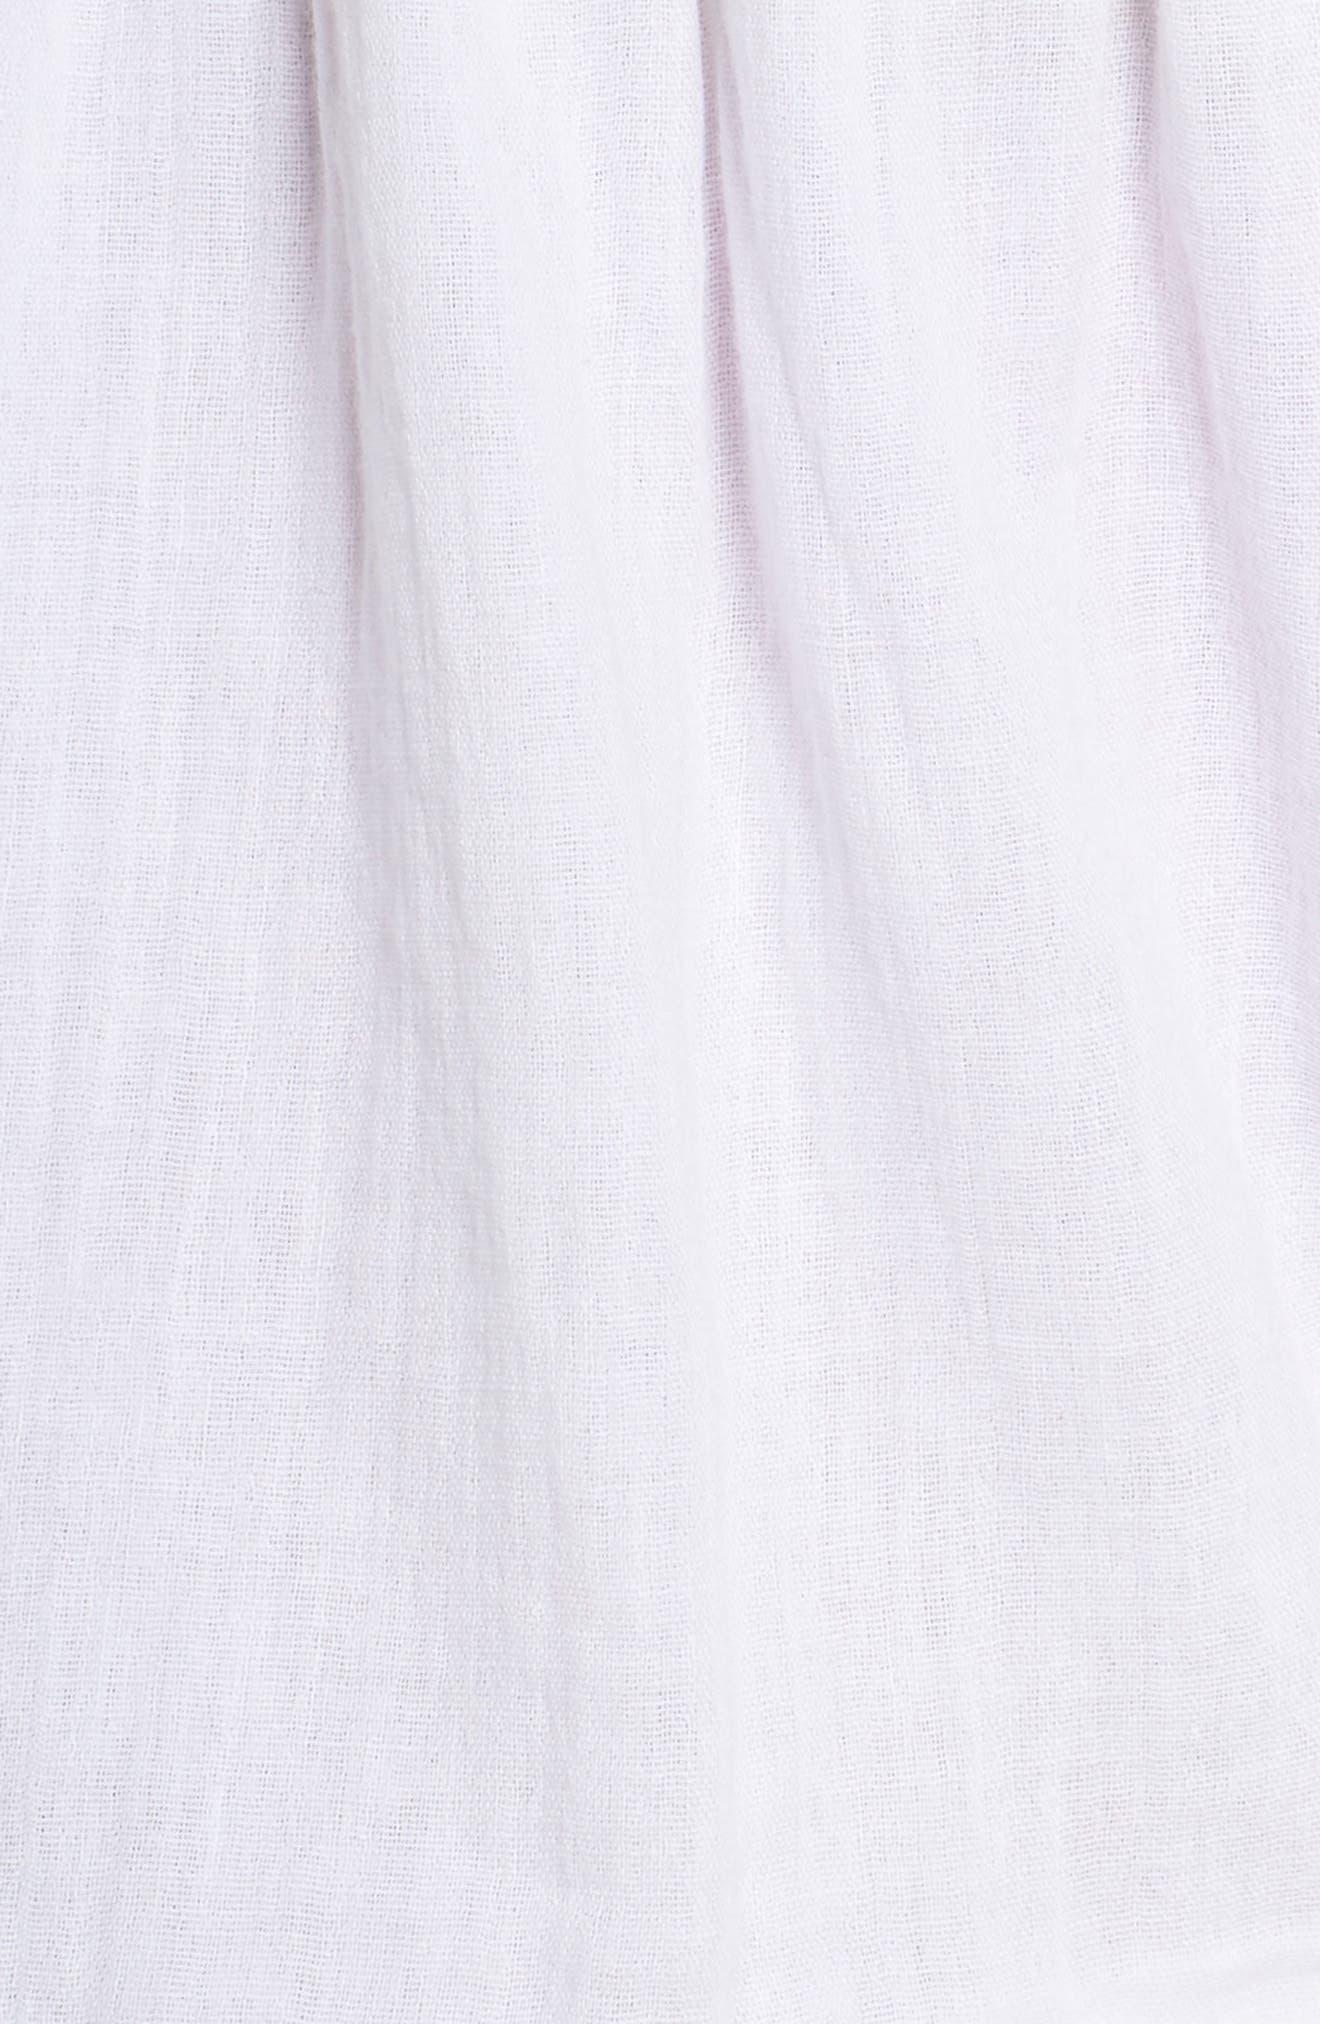 Cambria Ruffle Sleep Shorts,                             Alternate thumbnail 5, color,                             105